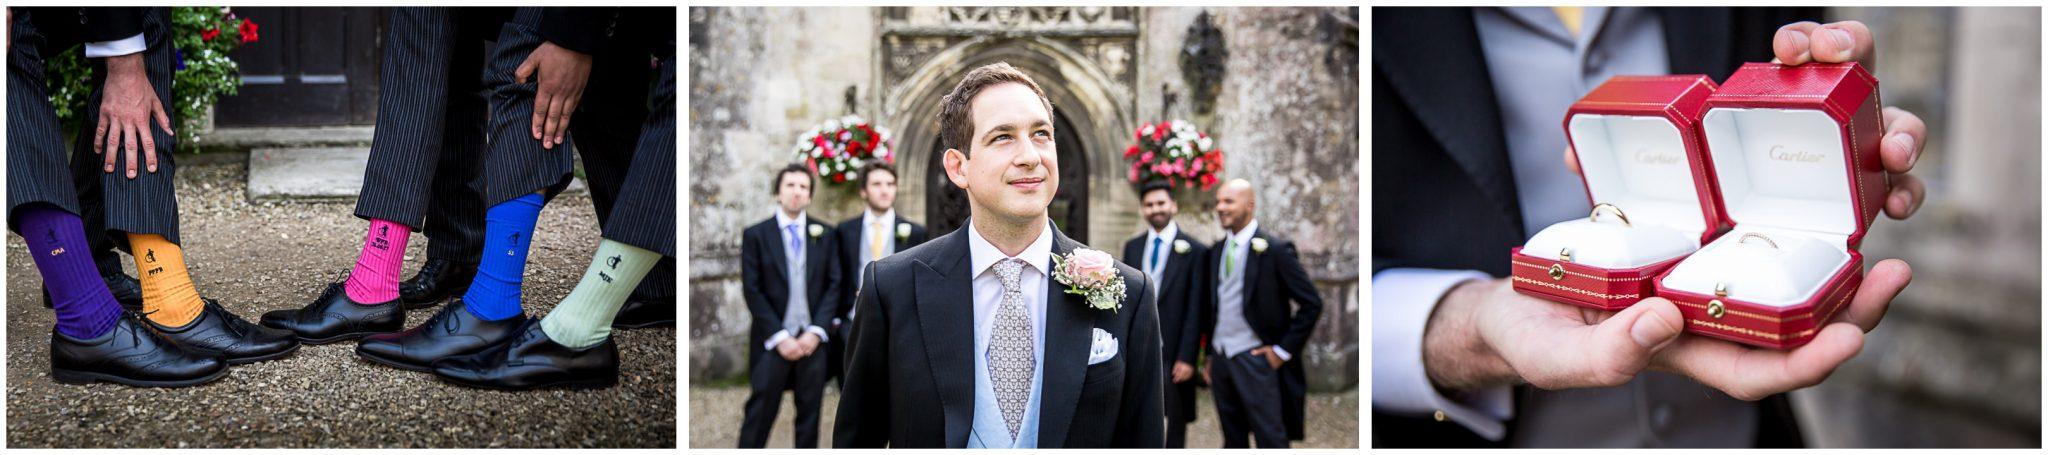 Groom and groomsmen before wedding ceremony